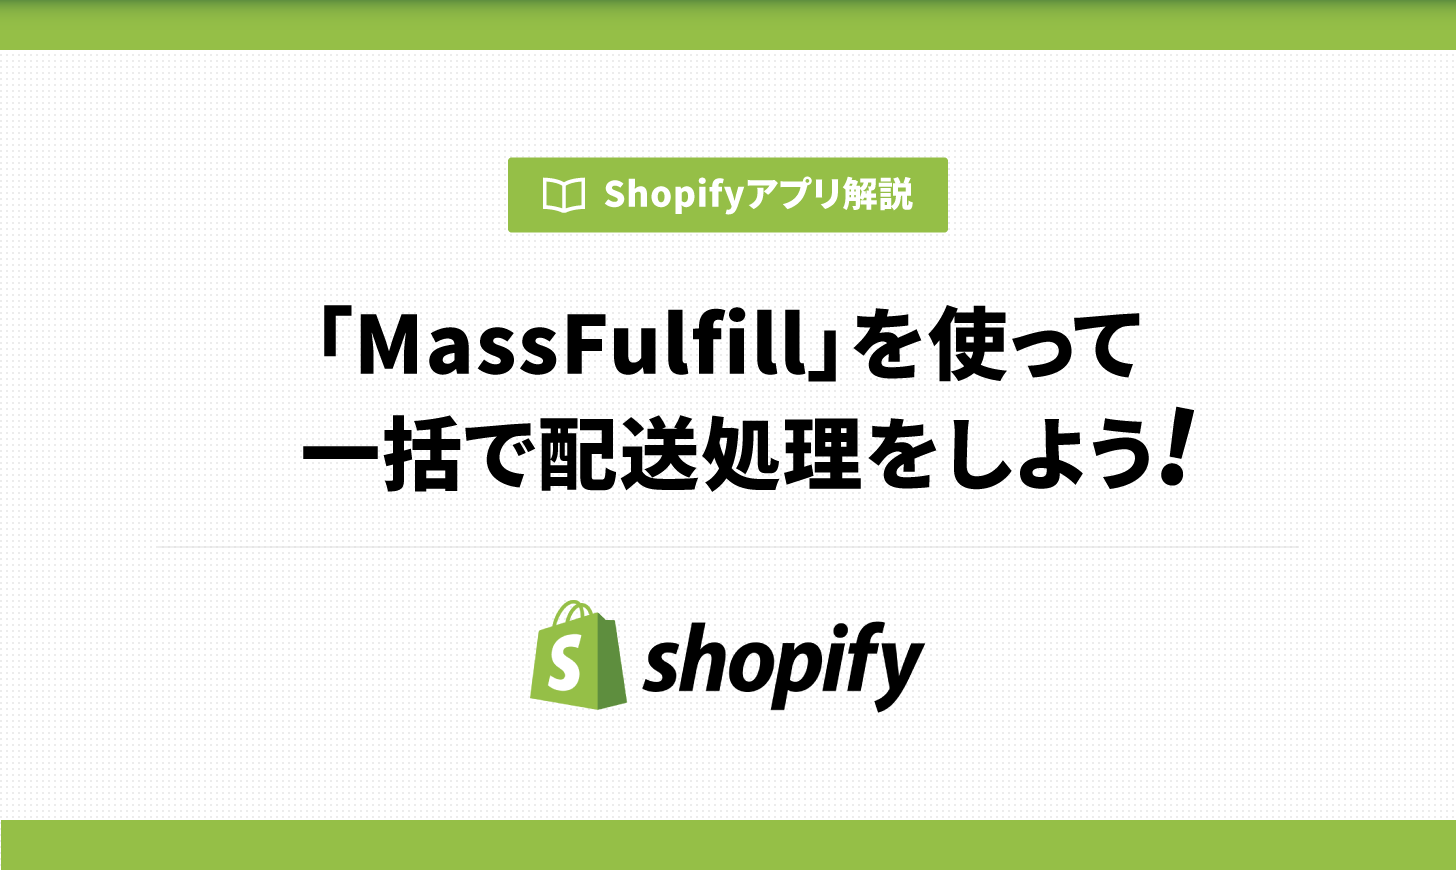 MassFulfillを使って一括で配送処理をしよう!